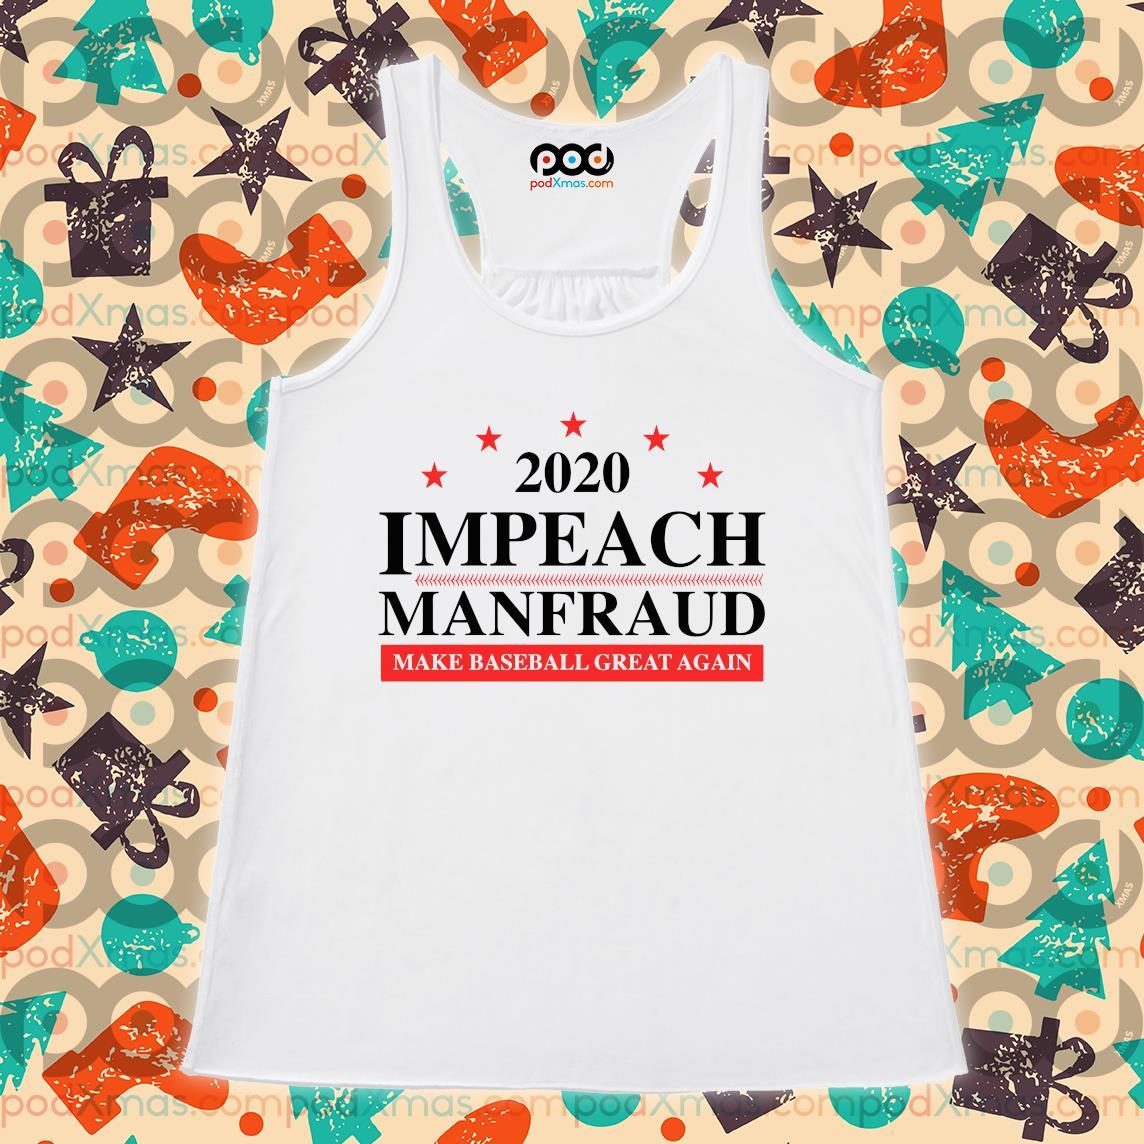 2020 Impeach manfred make baseball great again s Flowy tank PODxmas trang